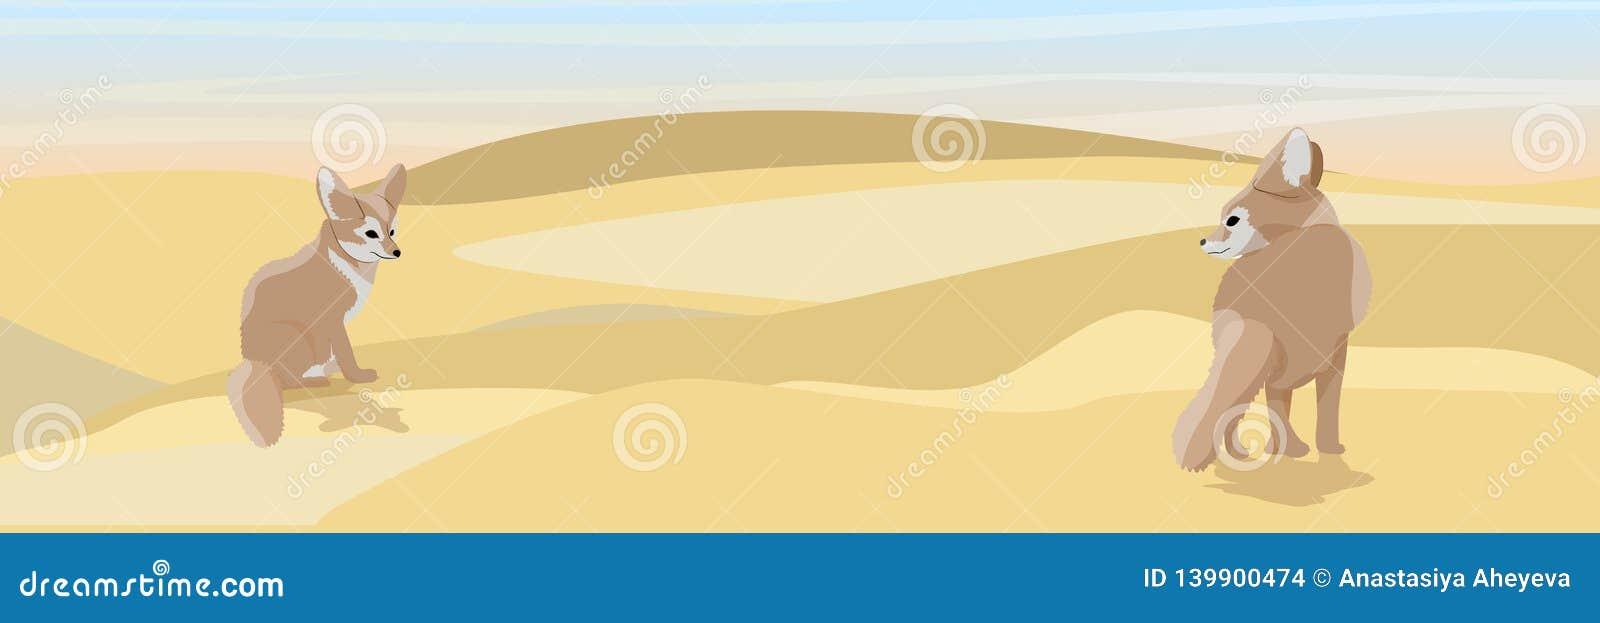 Dwa lisa opustoszały fenek na piasku